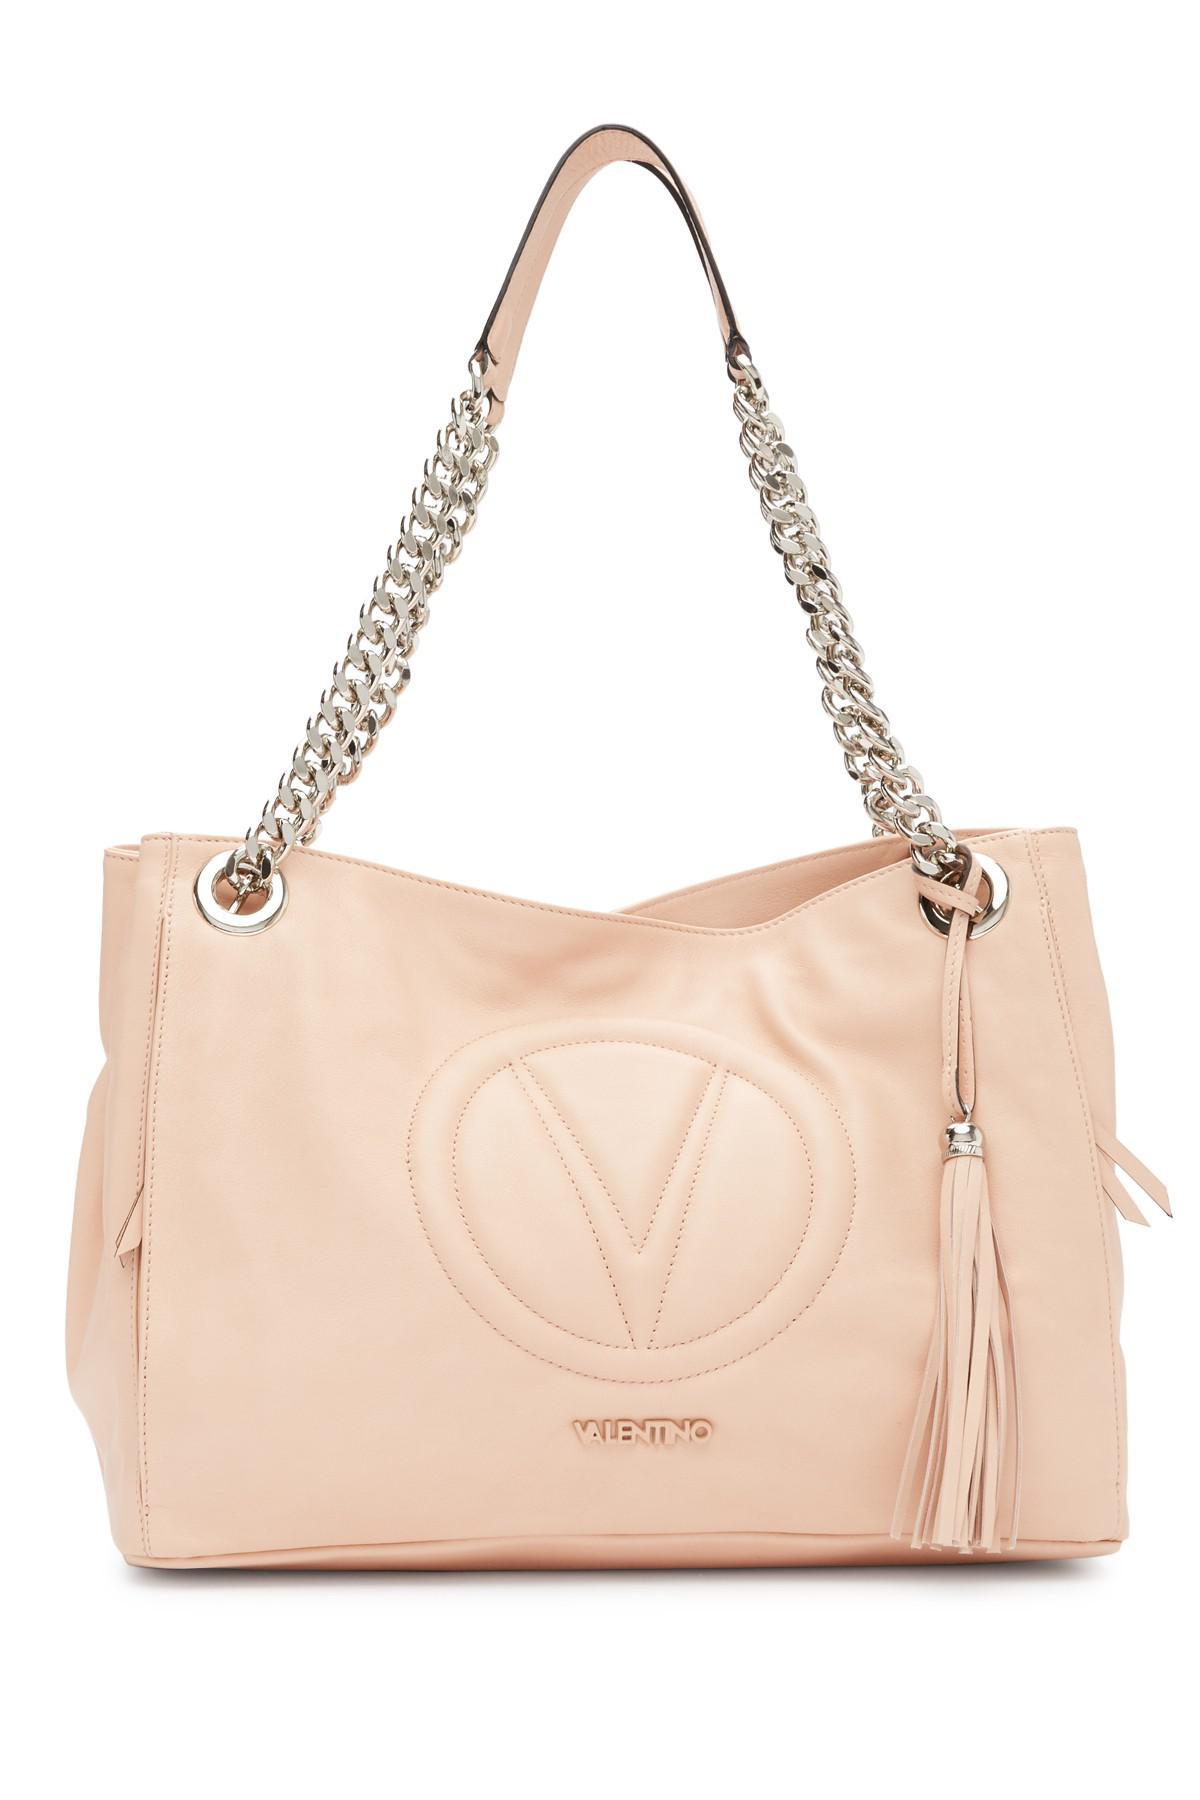 2ad84ad360d Lyst - Valentino By Mario Valentino Verra Leather Shoulder Bag